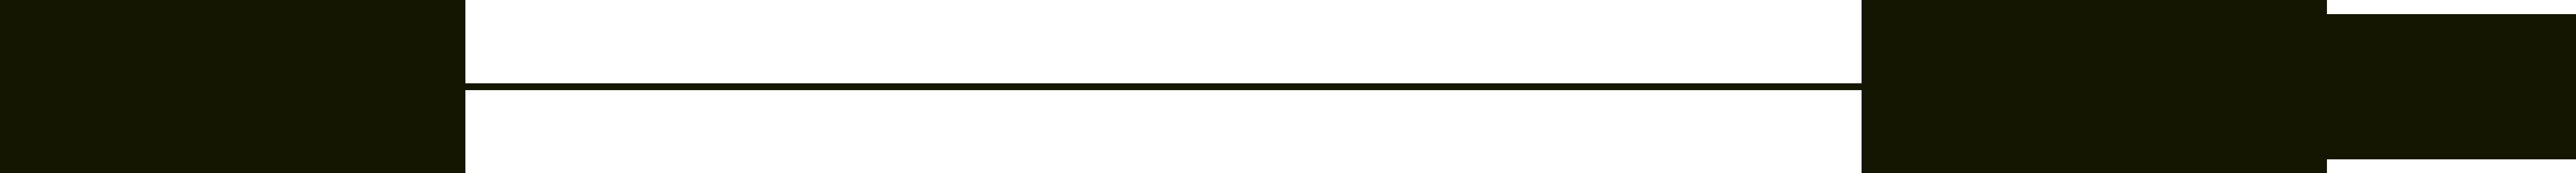 Star divider clipart jpg transparent stock Page Divider Group (71+) jpg transparent stock